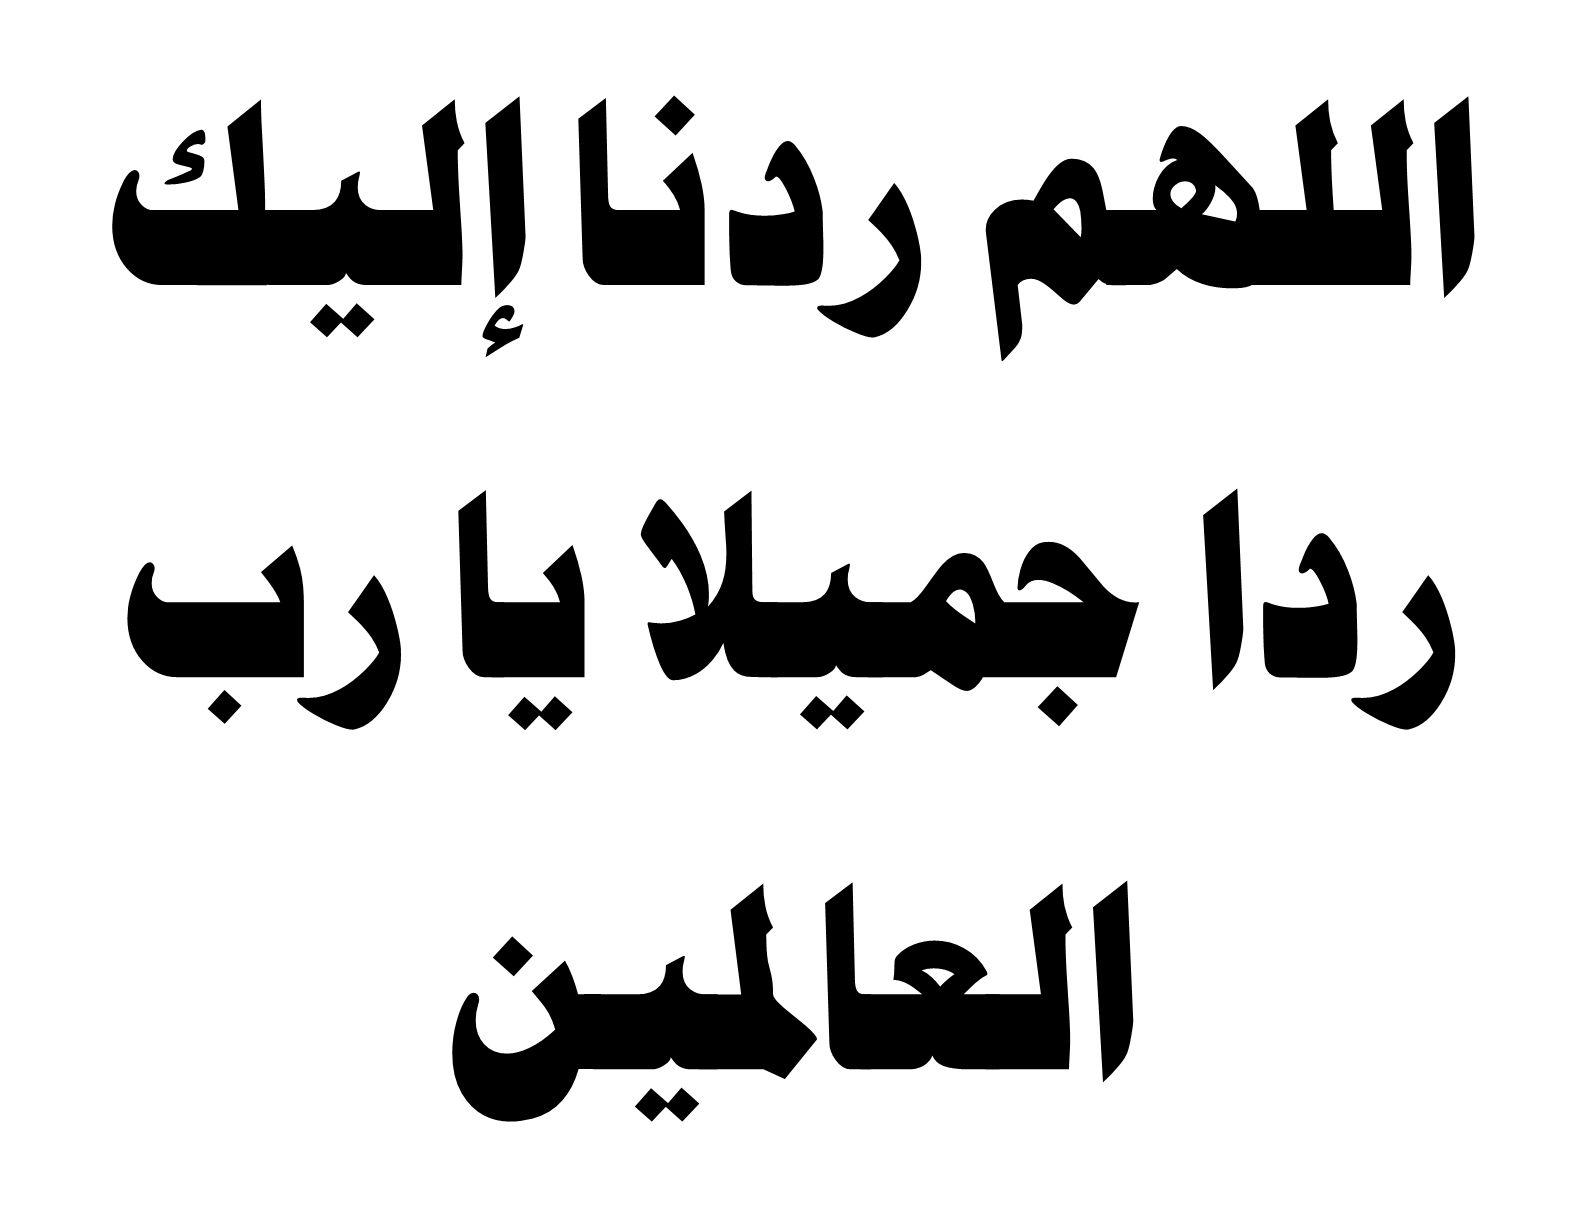 اللهم ردنا إليك ردا جميلا Arabic Calligraphy Calligraphy